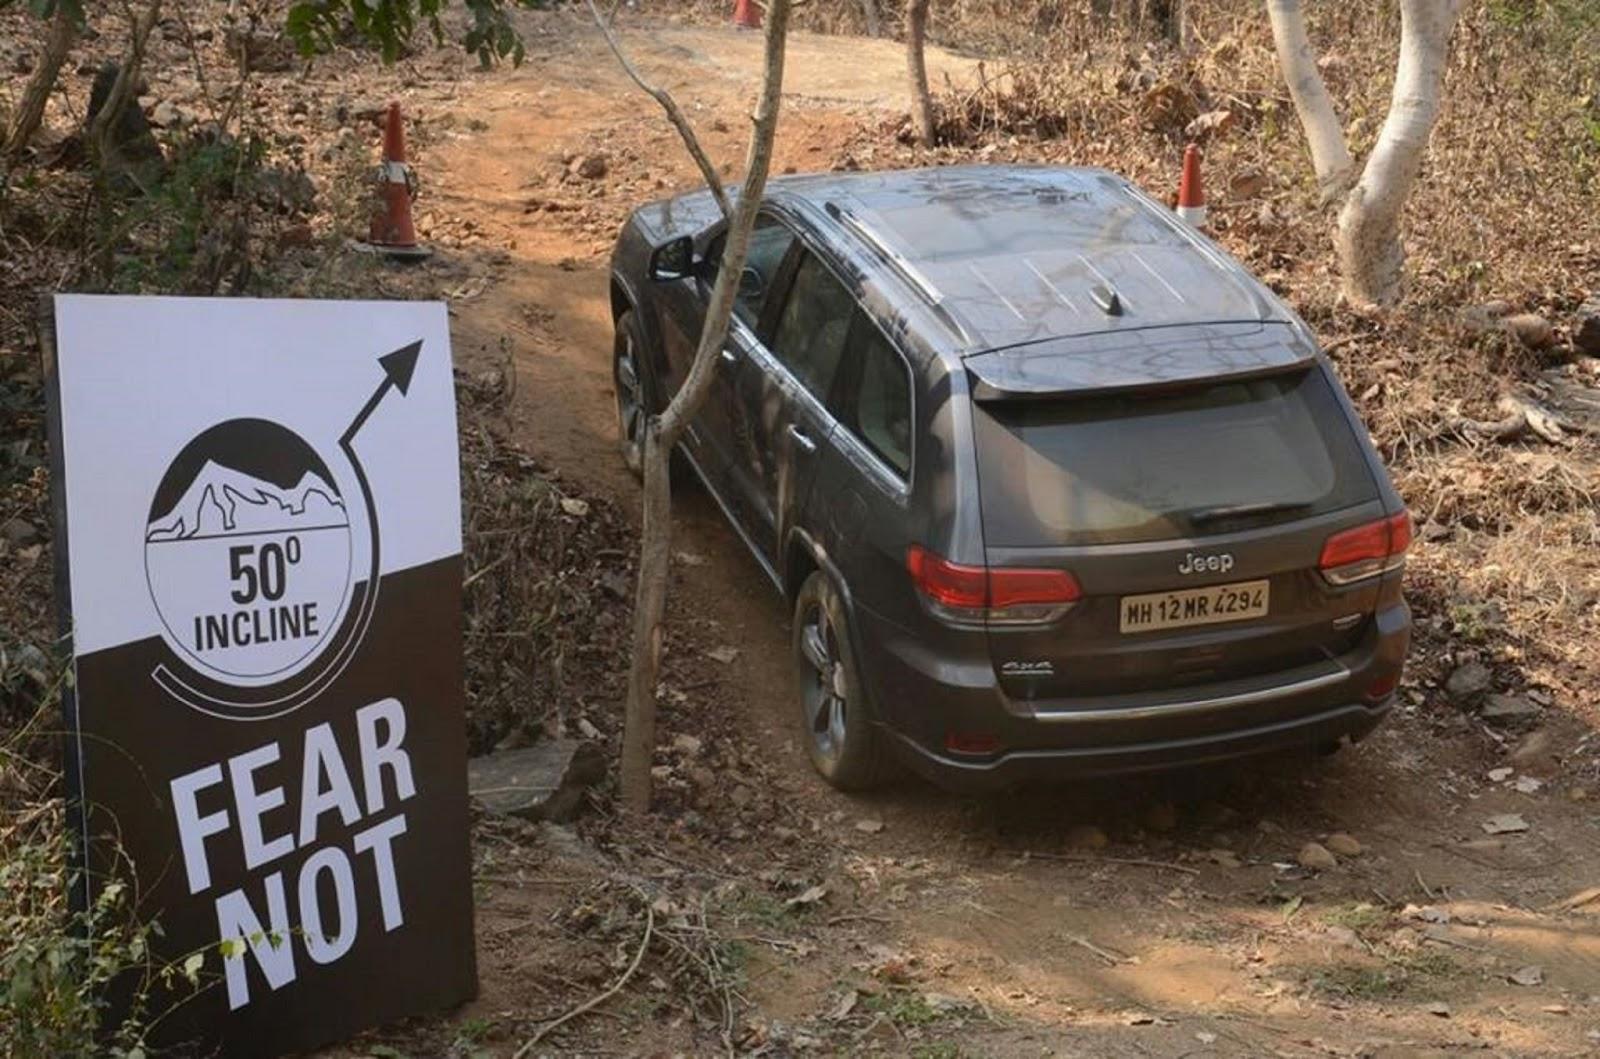 Camp Jeep Mumbai Edition - Licence to Drive